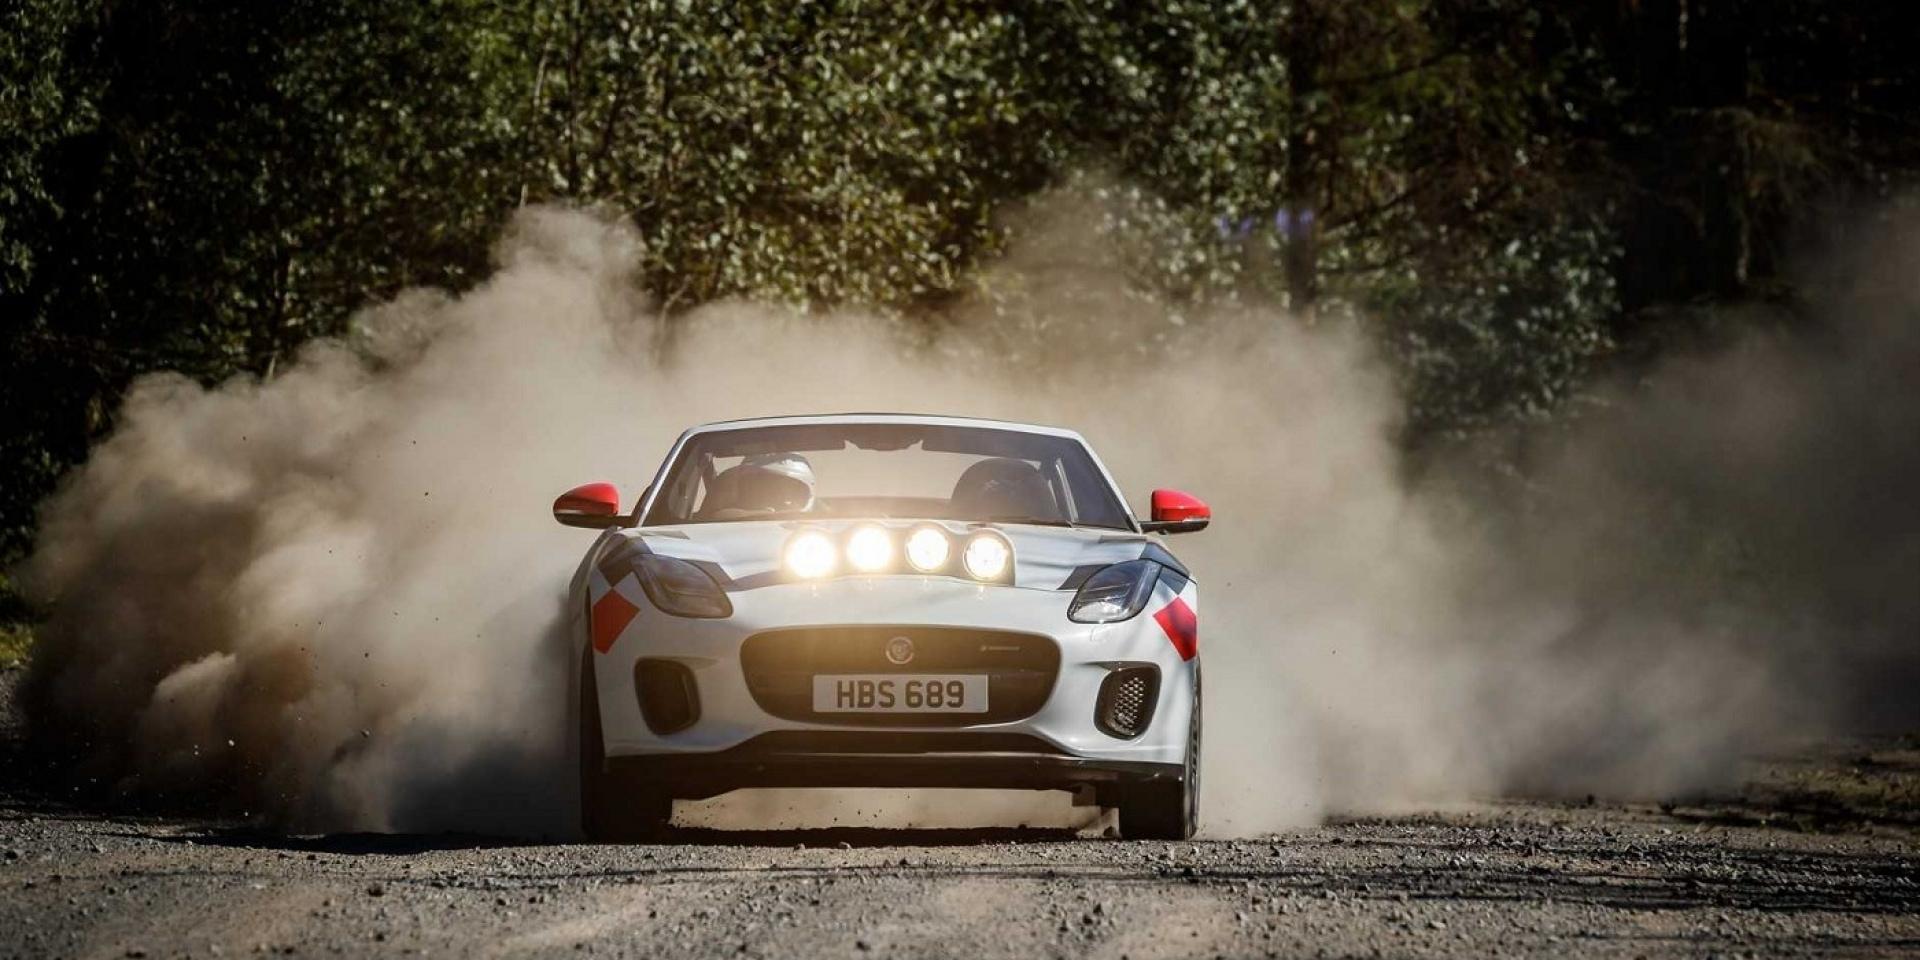 Jaguar打造F-Type拉力賽車,沒打算參加賽事